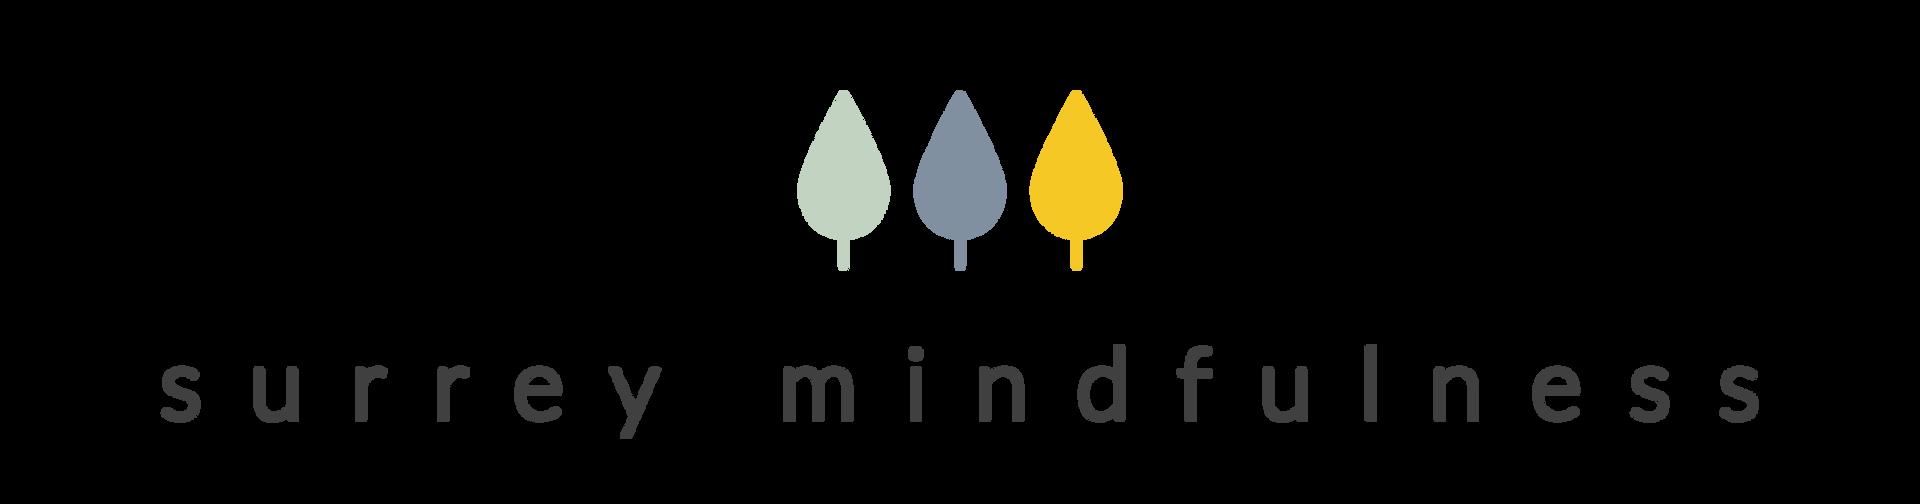 Coaching Branding | Brand Identity Design by Fresh Leaf Creative